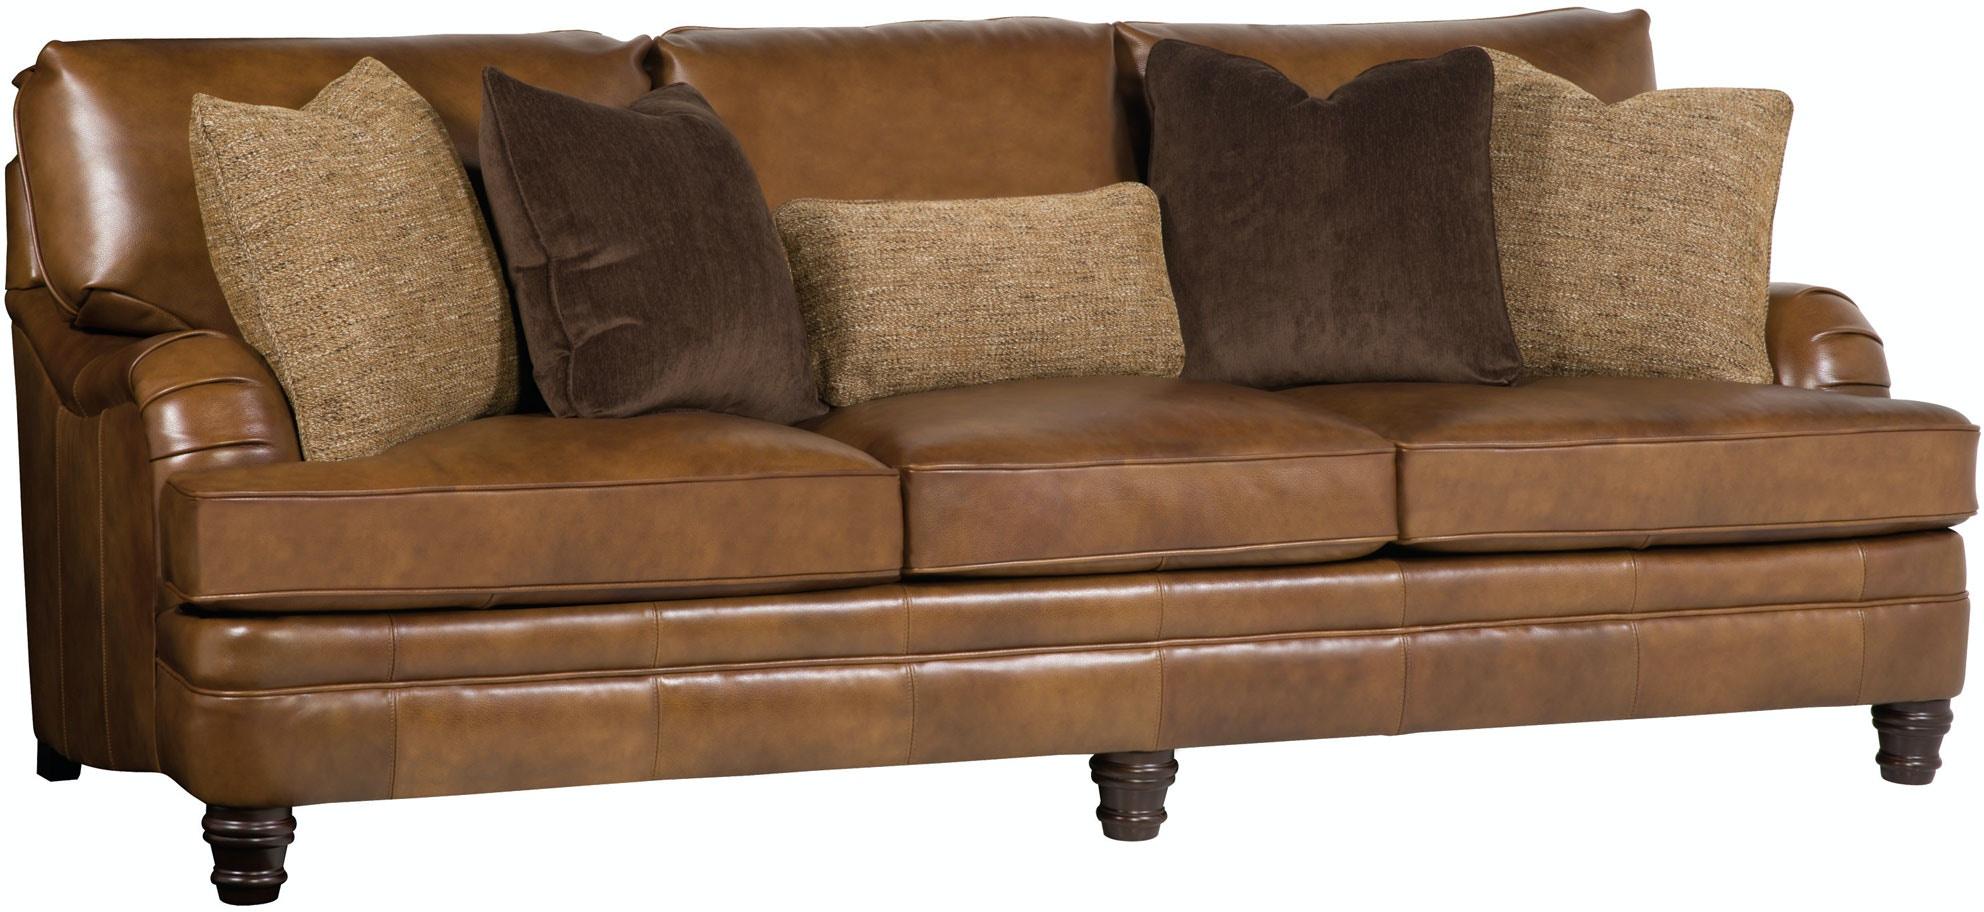 Bernhardt Furniture 7077l Living Room Tarleton Sofa